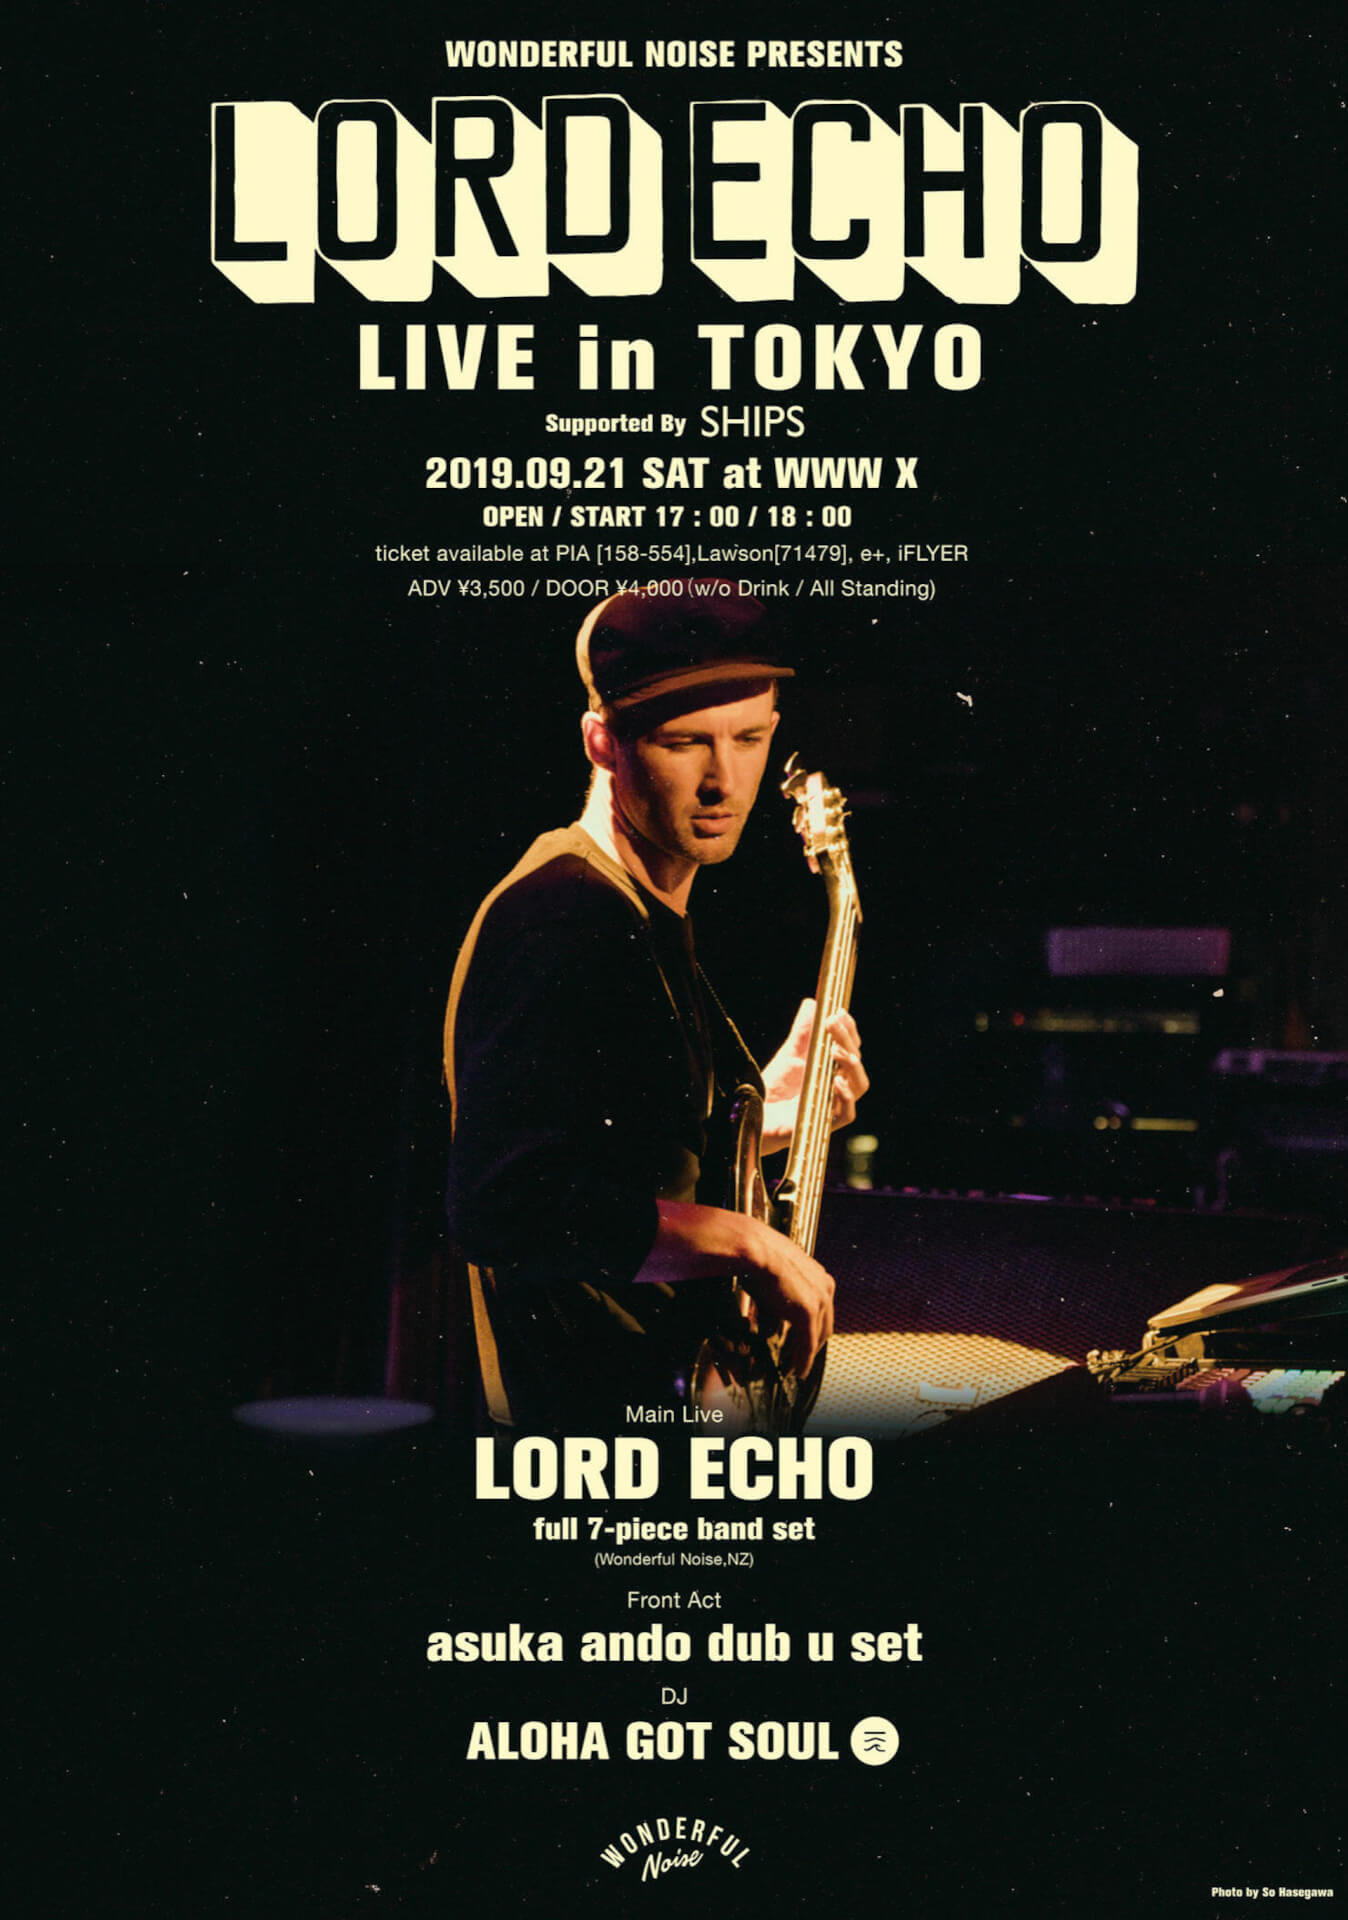 LORD ECHOと夏の果てまで。過去最大7人編成のフルバンドセットでWWW Xに登場|共演にasuka ando、ALOHA GOT SOUL 岡山・大阪公演にFNCY、Ovall、SANABAGUN.ら music190910-lordecho-2